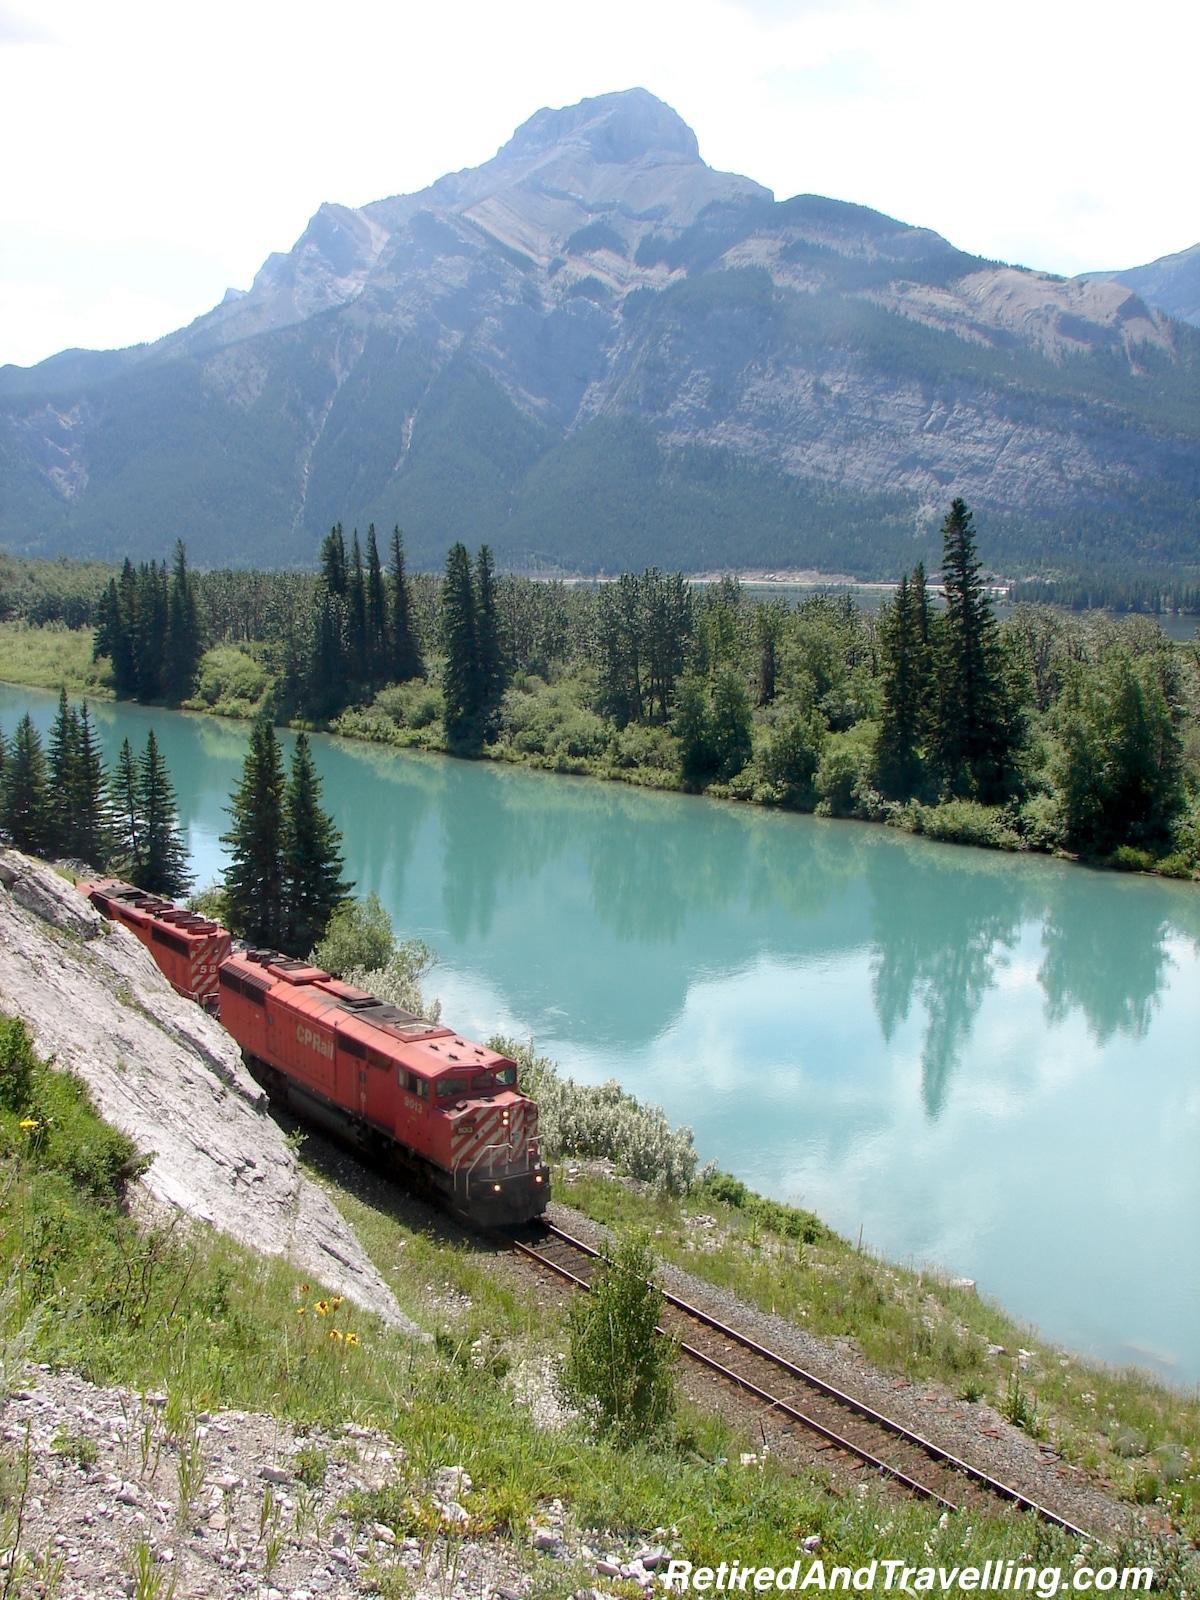 Rockies Train Travel - National Parks trip.jpg